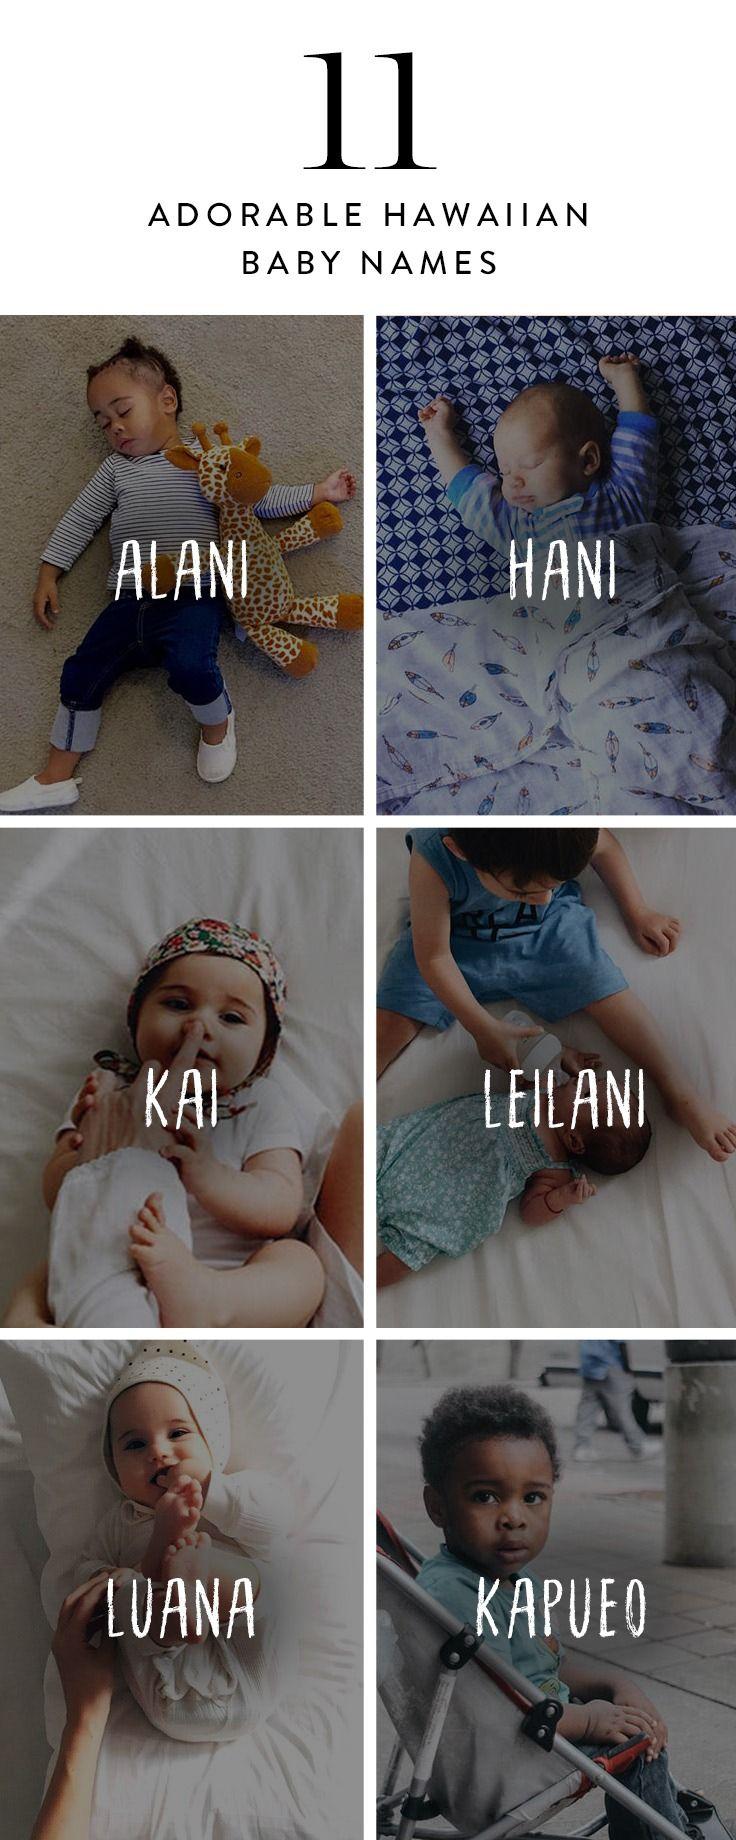 Here are 11 adorable Hawaiian baby names.